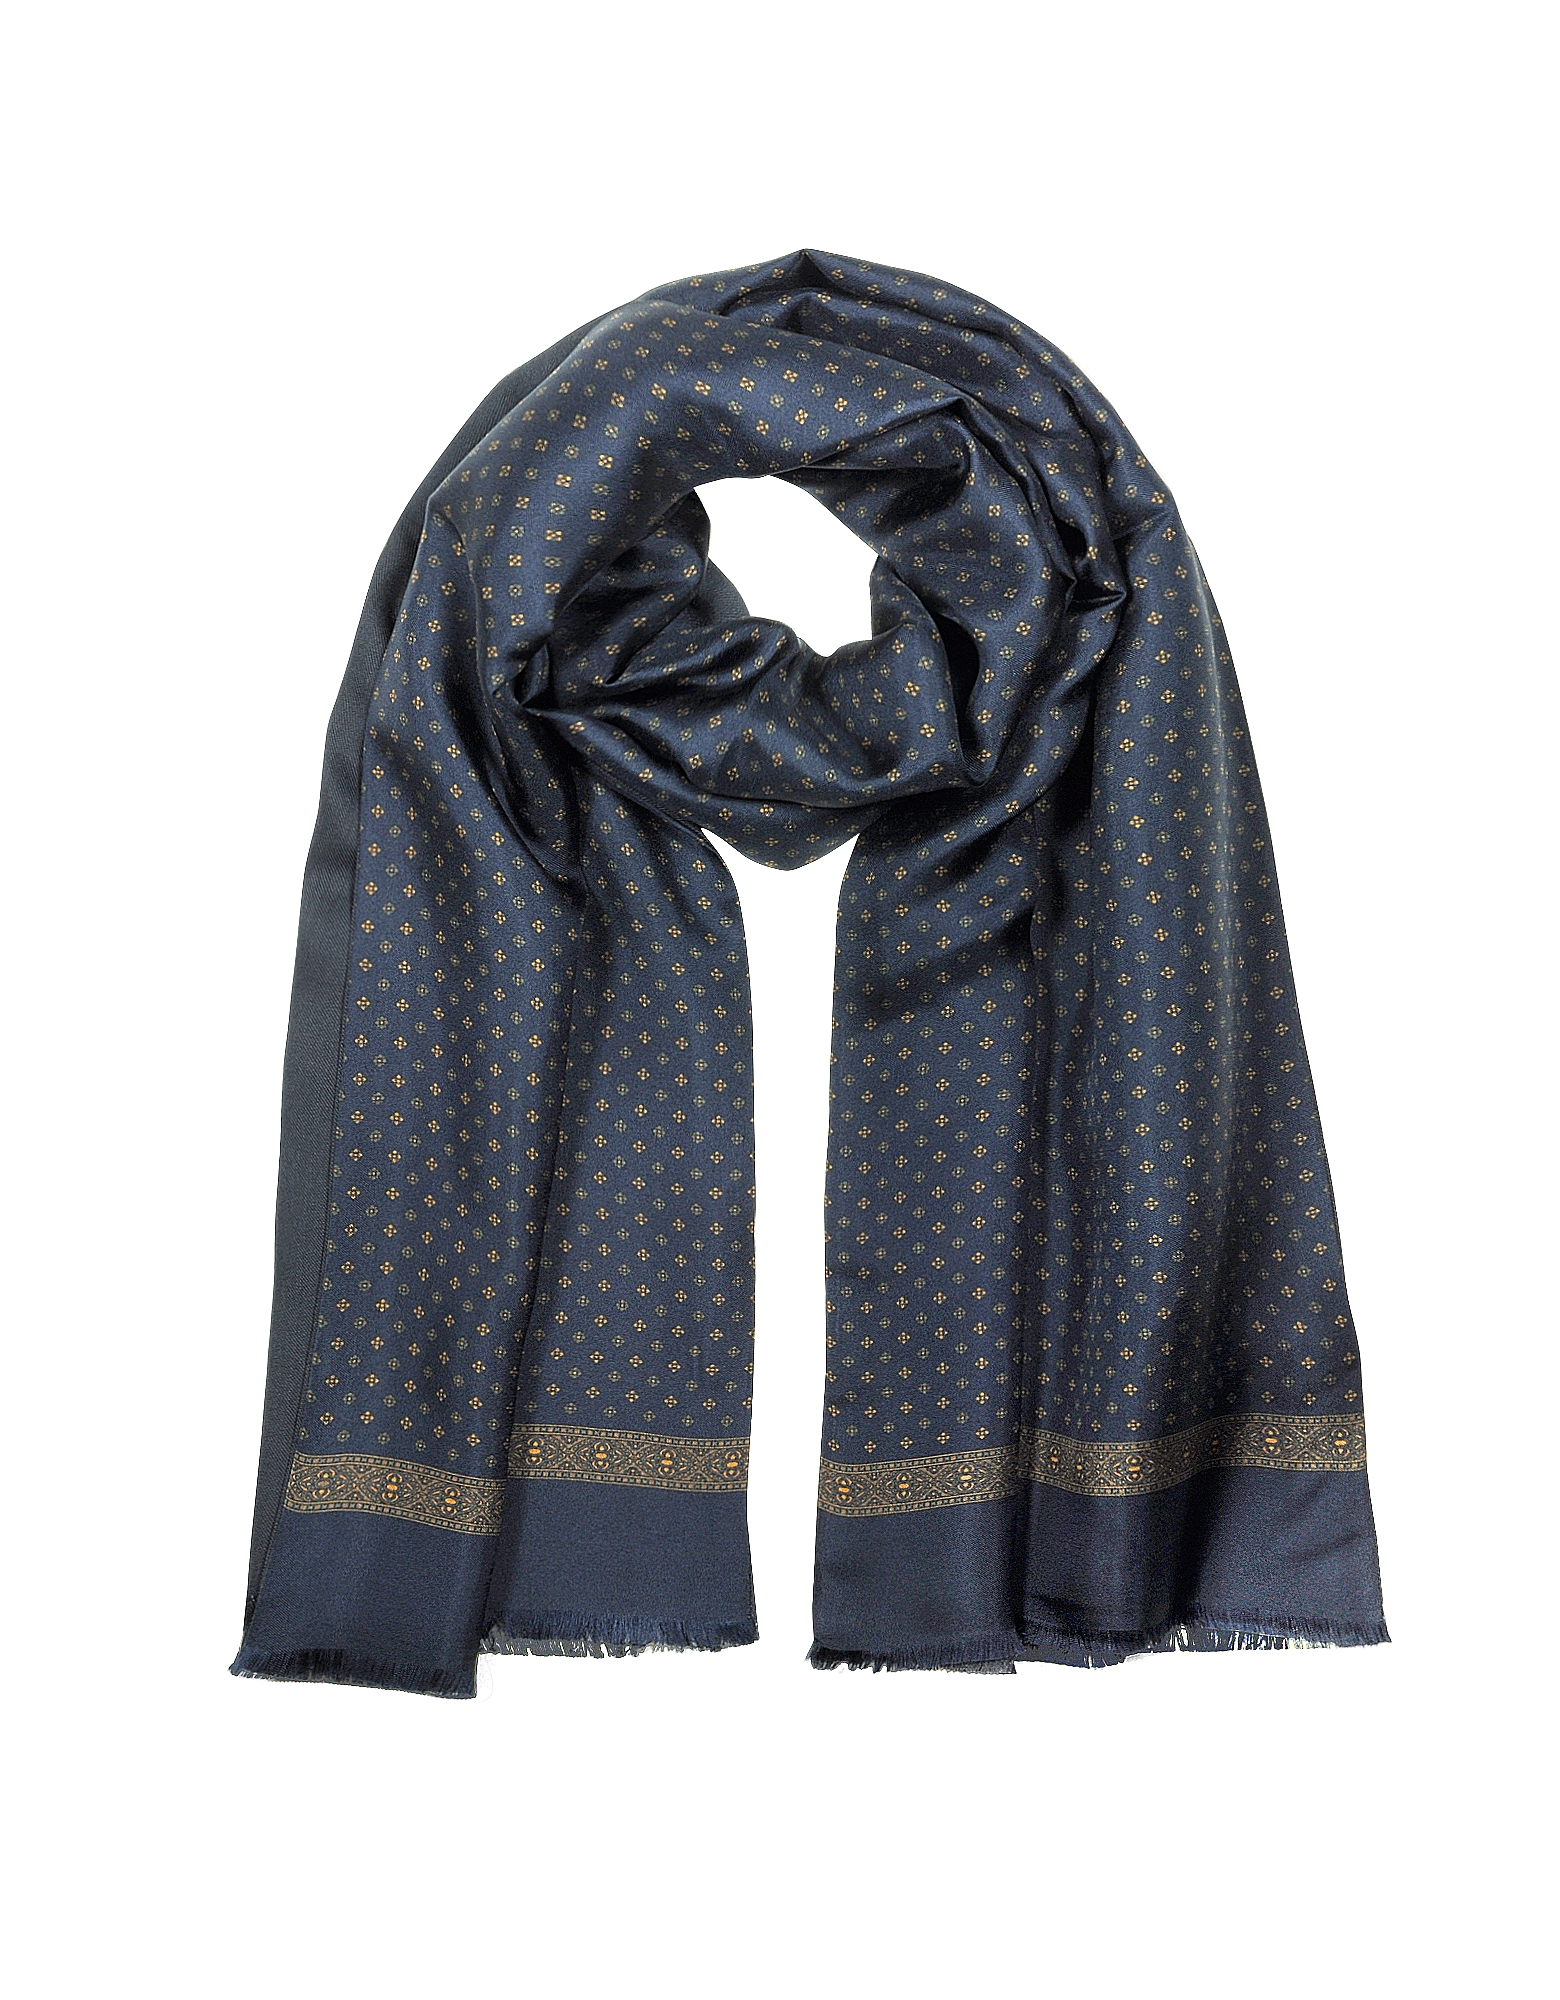 Forzieri Designer Men's Scarves, Modal & Silk Floral Print Men's Fringed Scarf